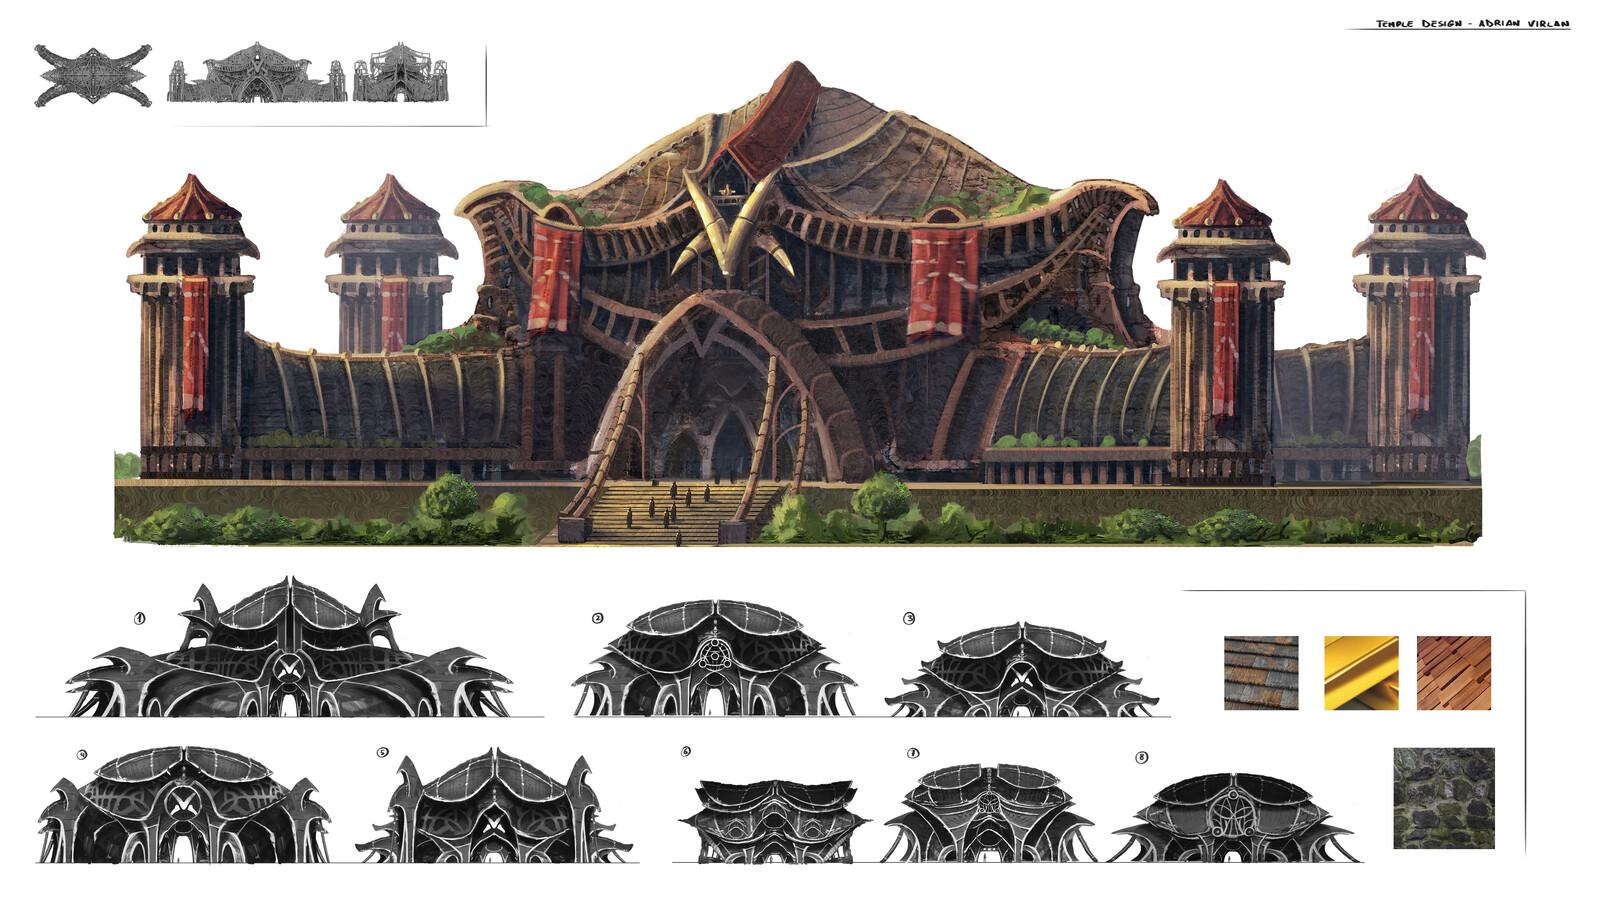 Evil temple design